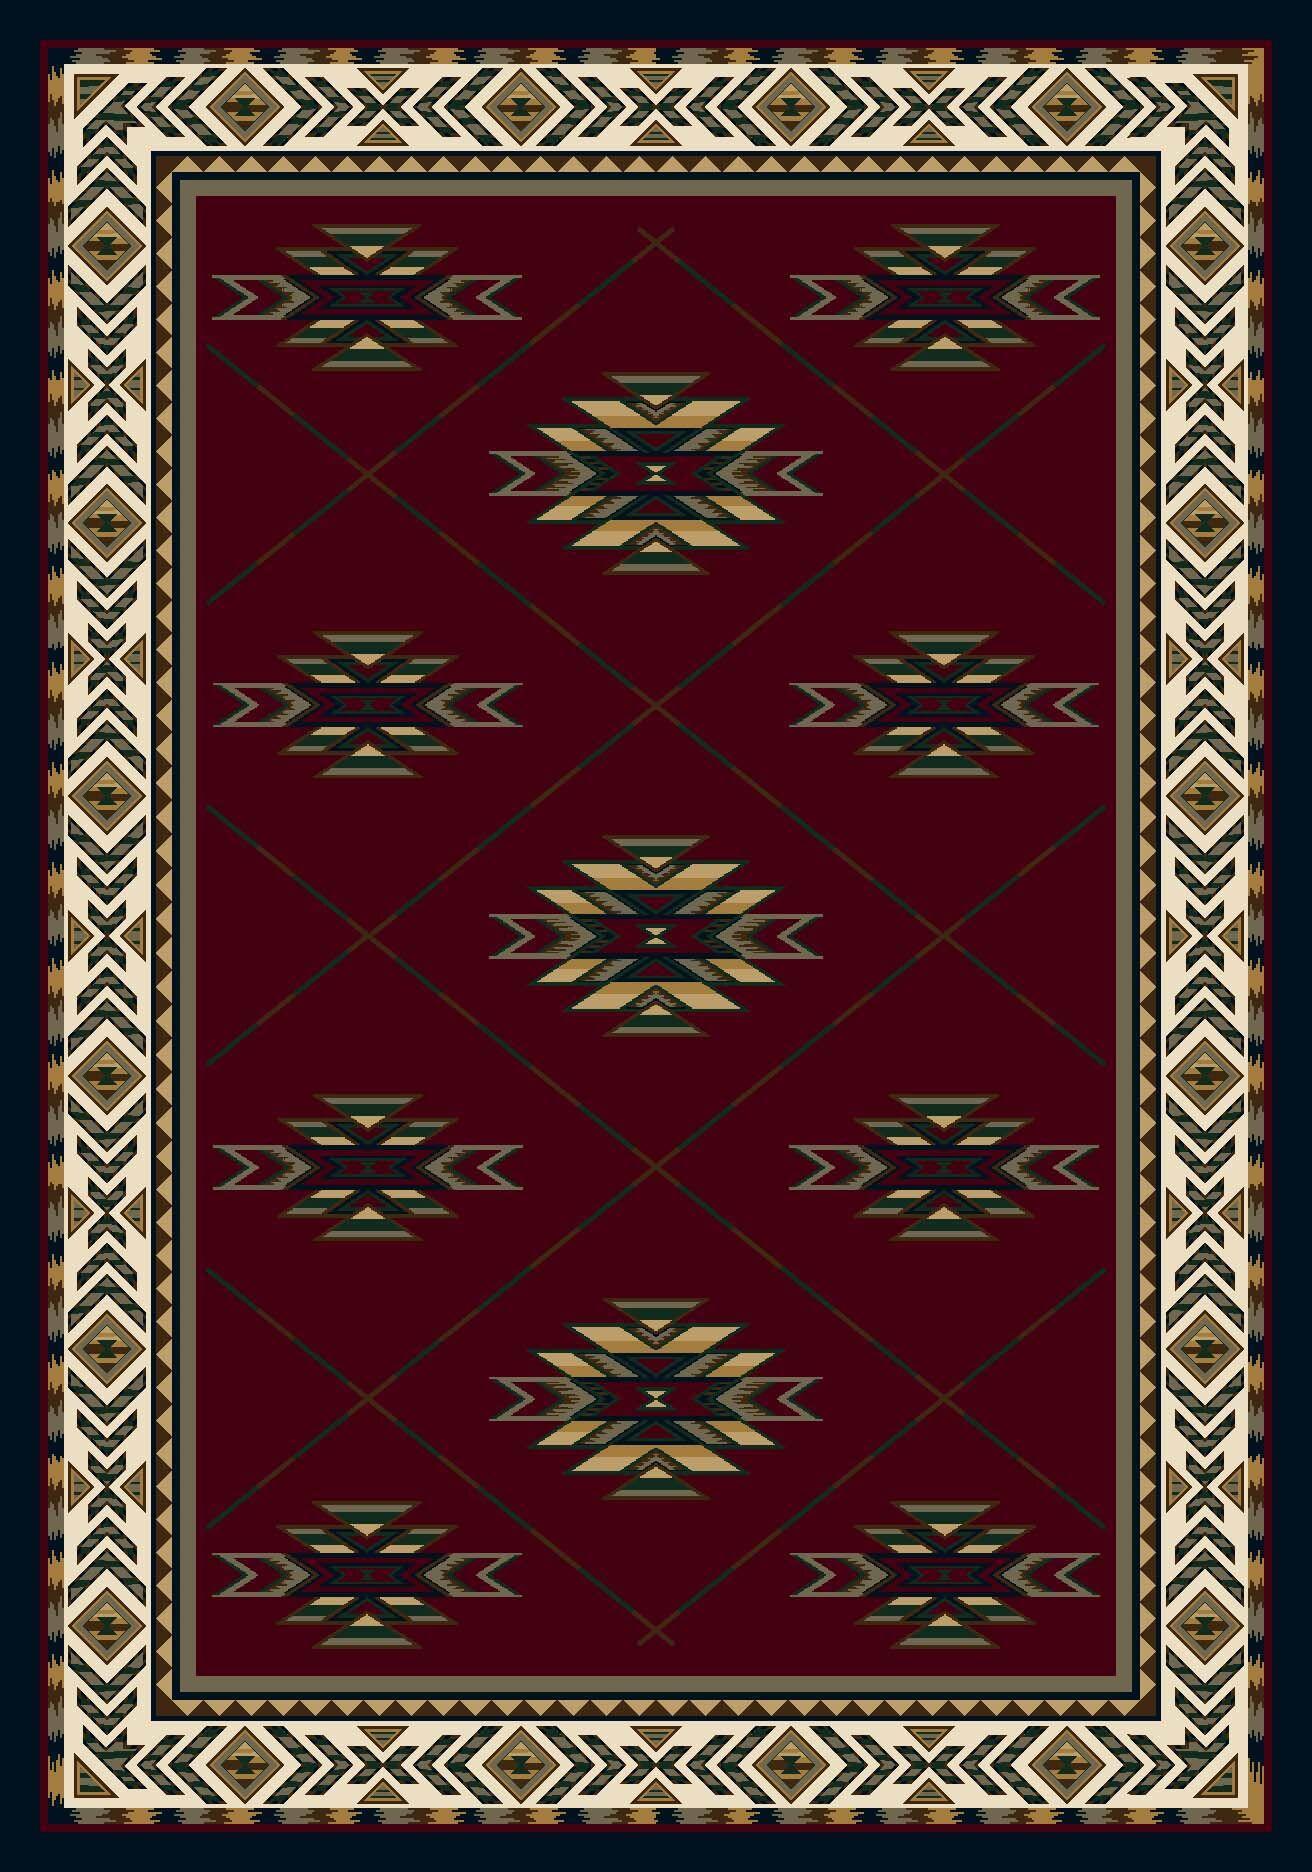 Signature Shiba Garnet Sapphire Area Rug Rug Size: Square 7'7